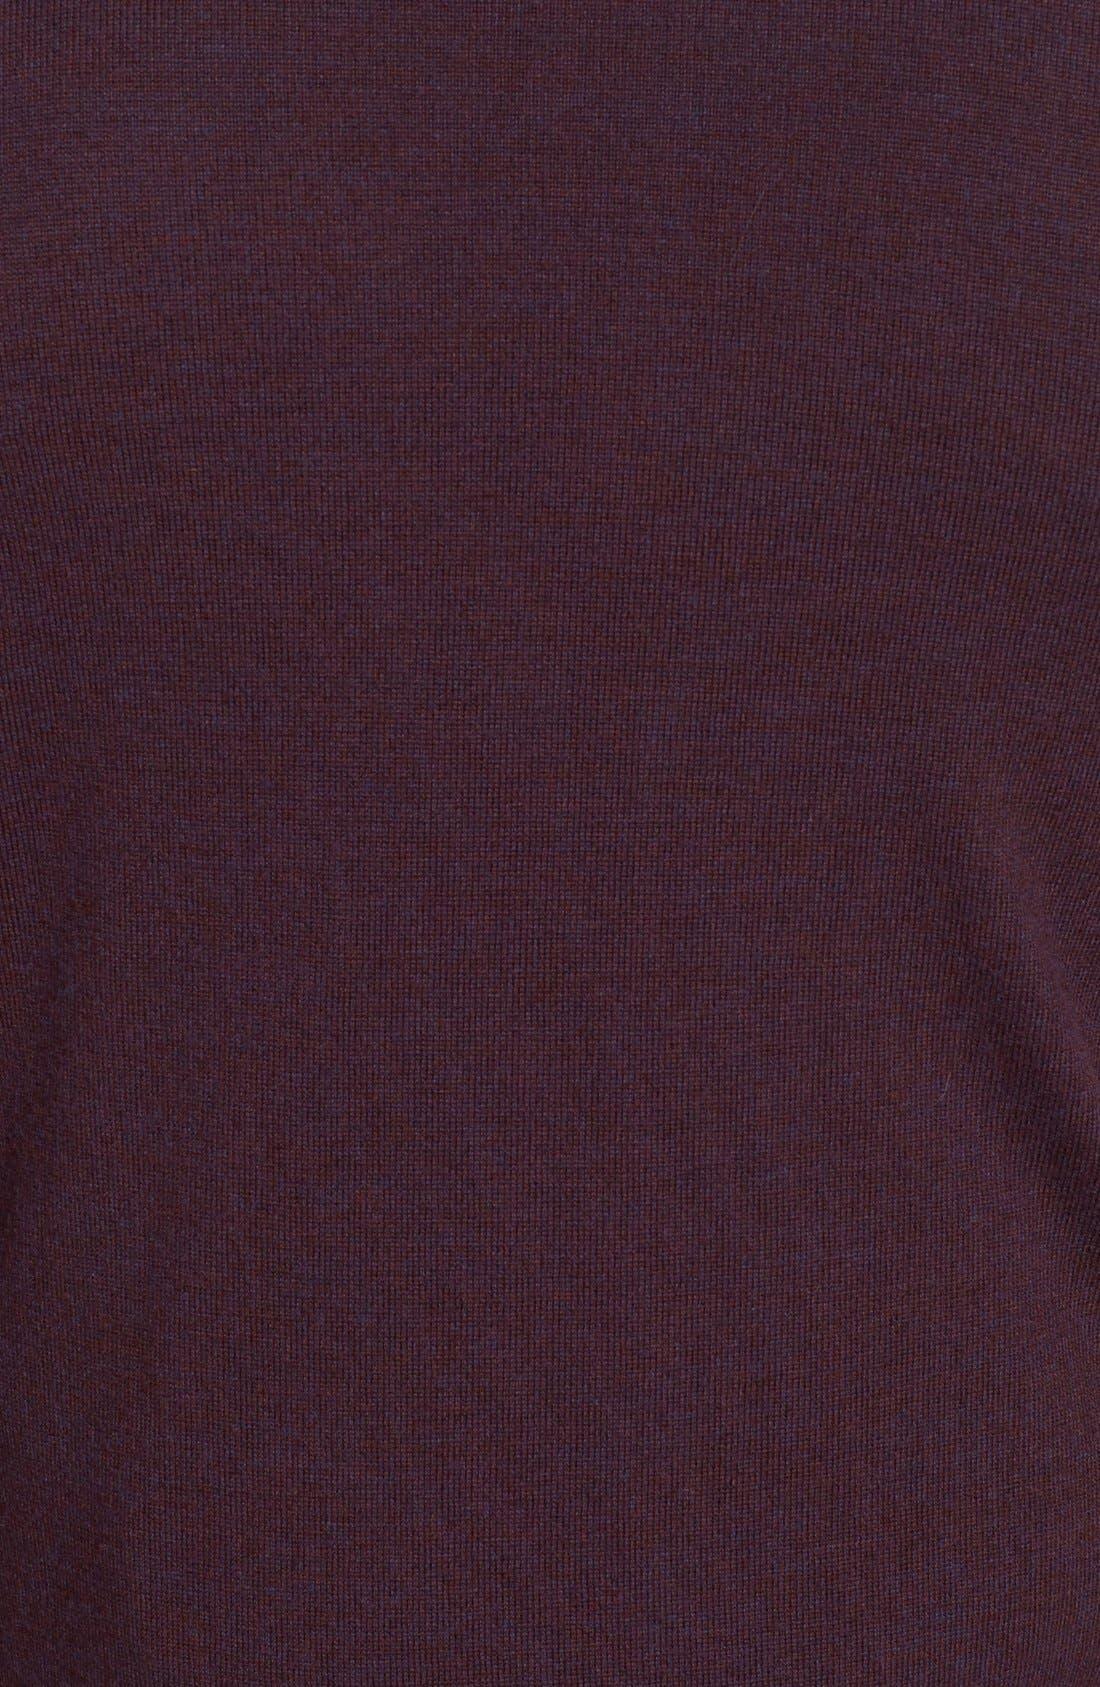 Alternate Image 3  - Burberry Brit Trim Fit Check Shoulder V-Neck Merino Wool Sweater